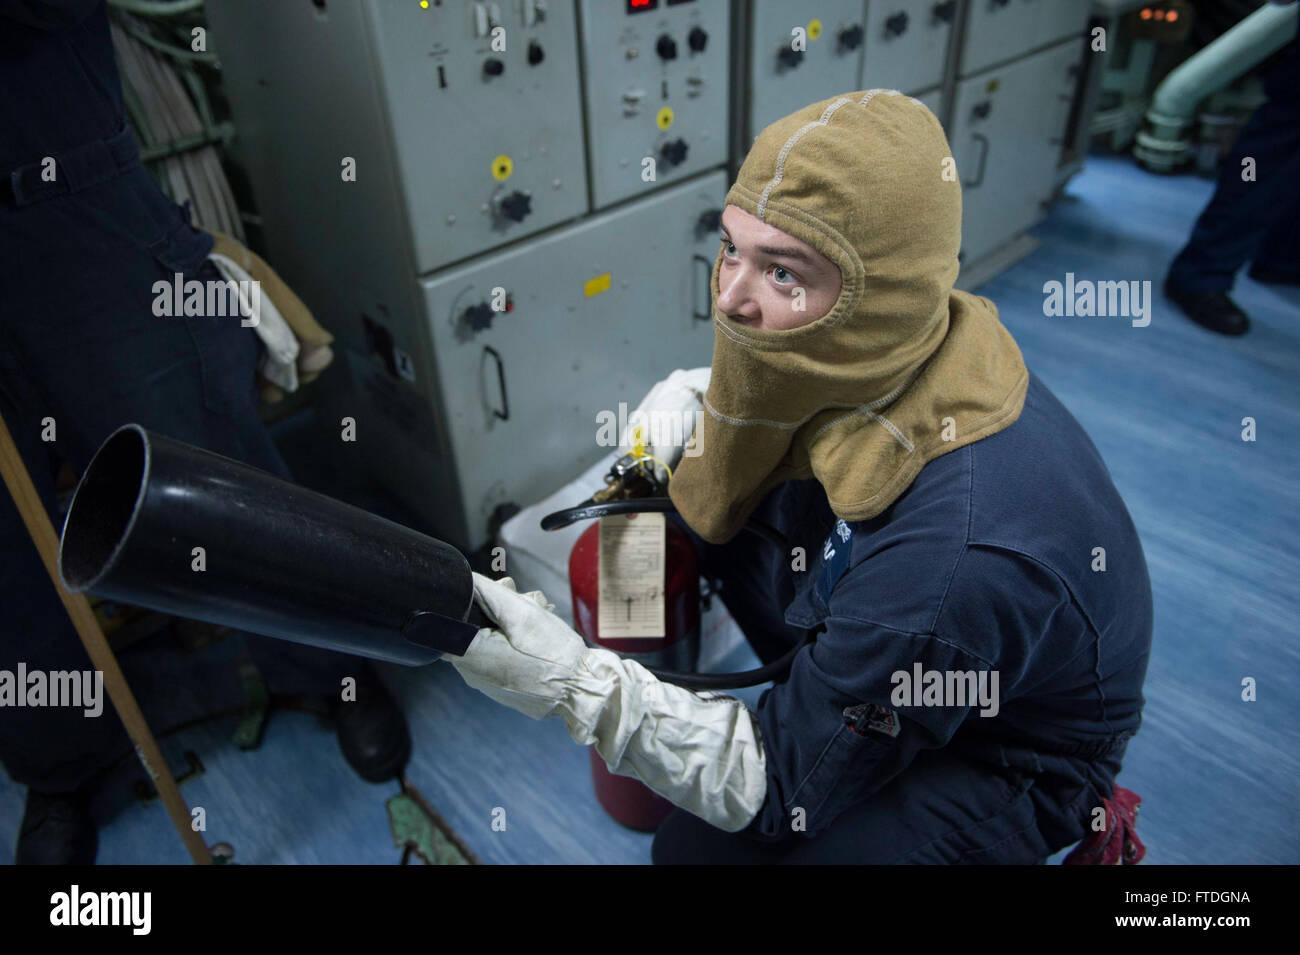 131008-N-UD469-082: MEDITERRANEAN SEA (Oct. 8, 2013) - Machinery Repairman 2nd Class Robert Briggs prepares to fight Stock Photo